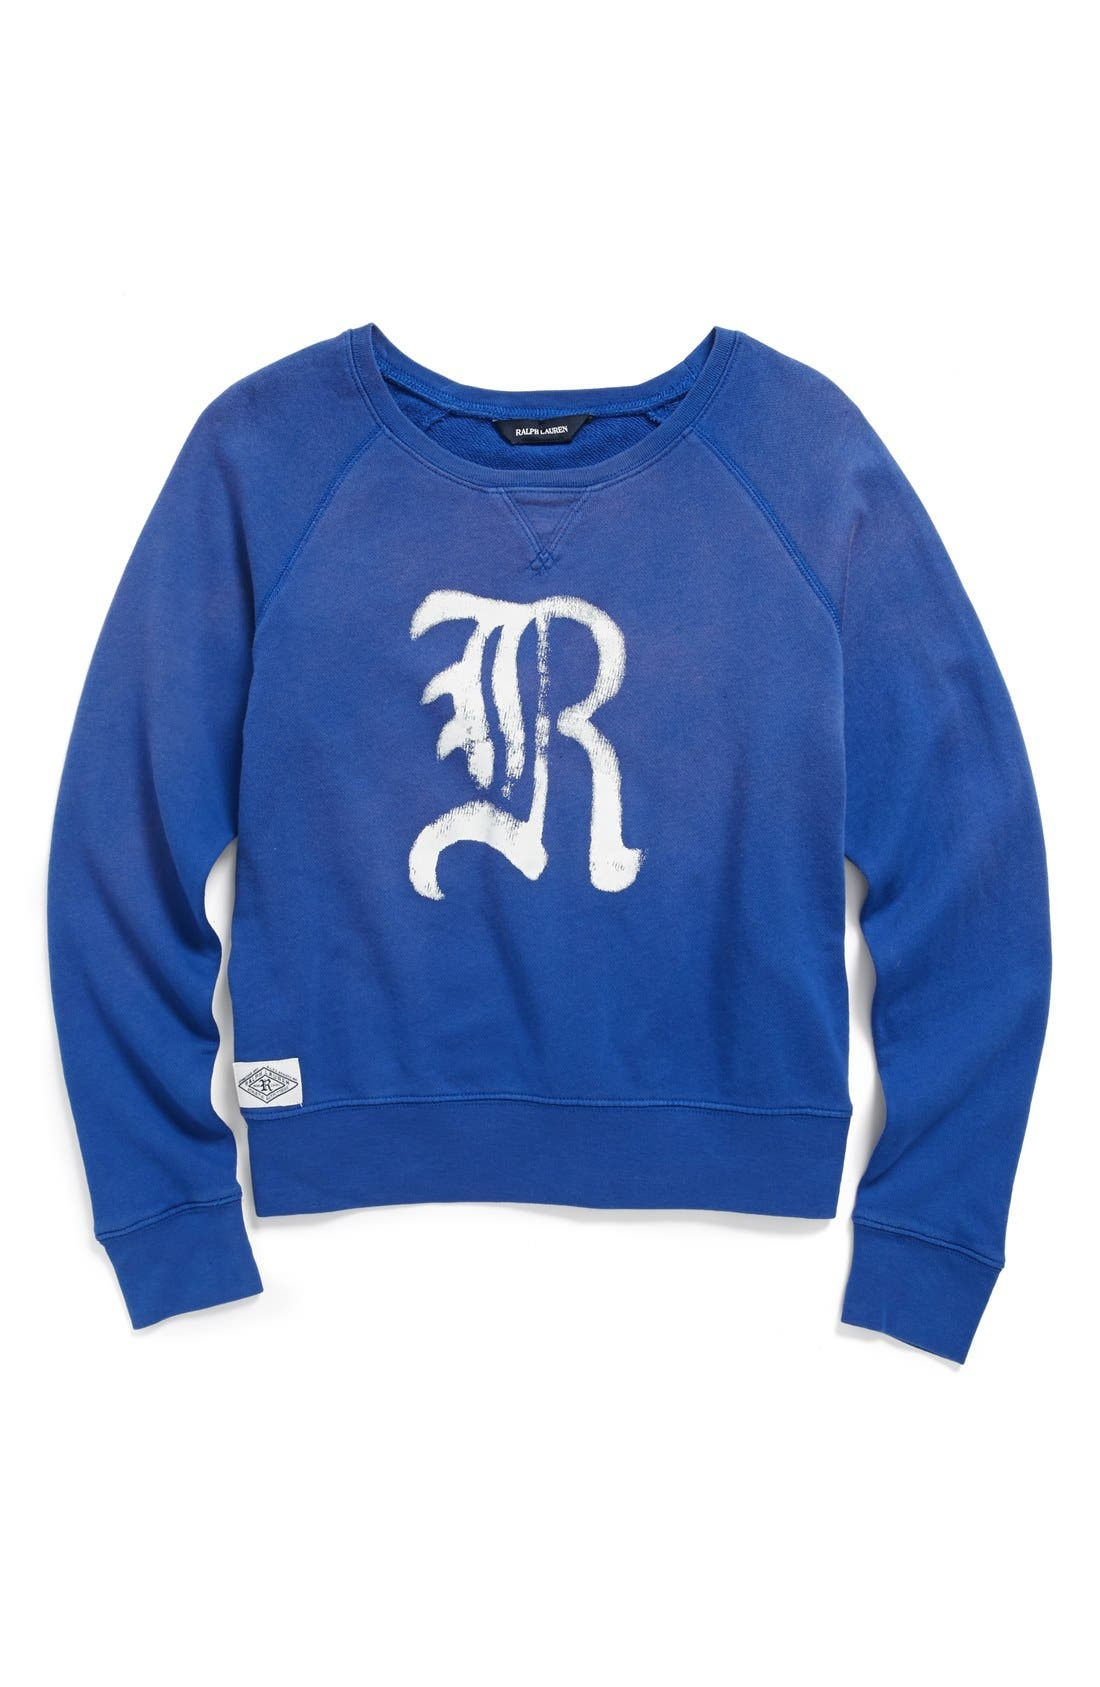 Alternate Image 1 Selected - Ralph Lauren Logo Sweatshirt (Big Girls)